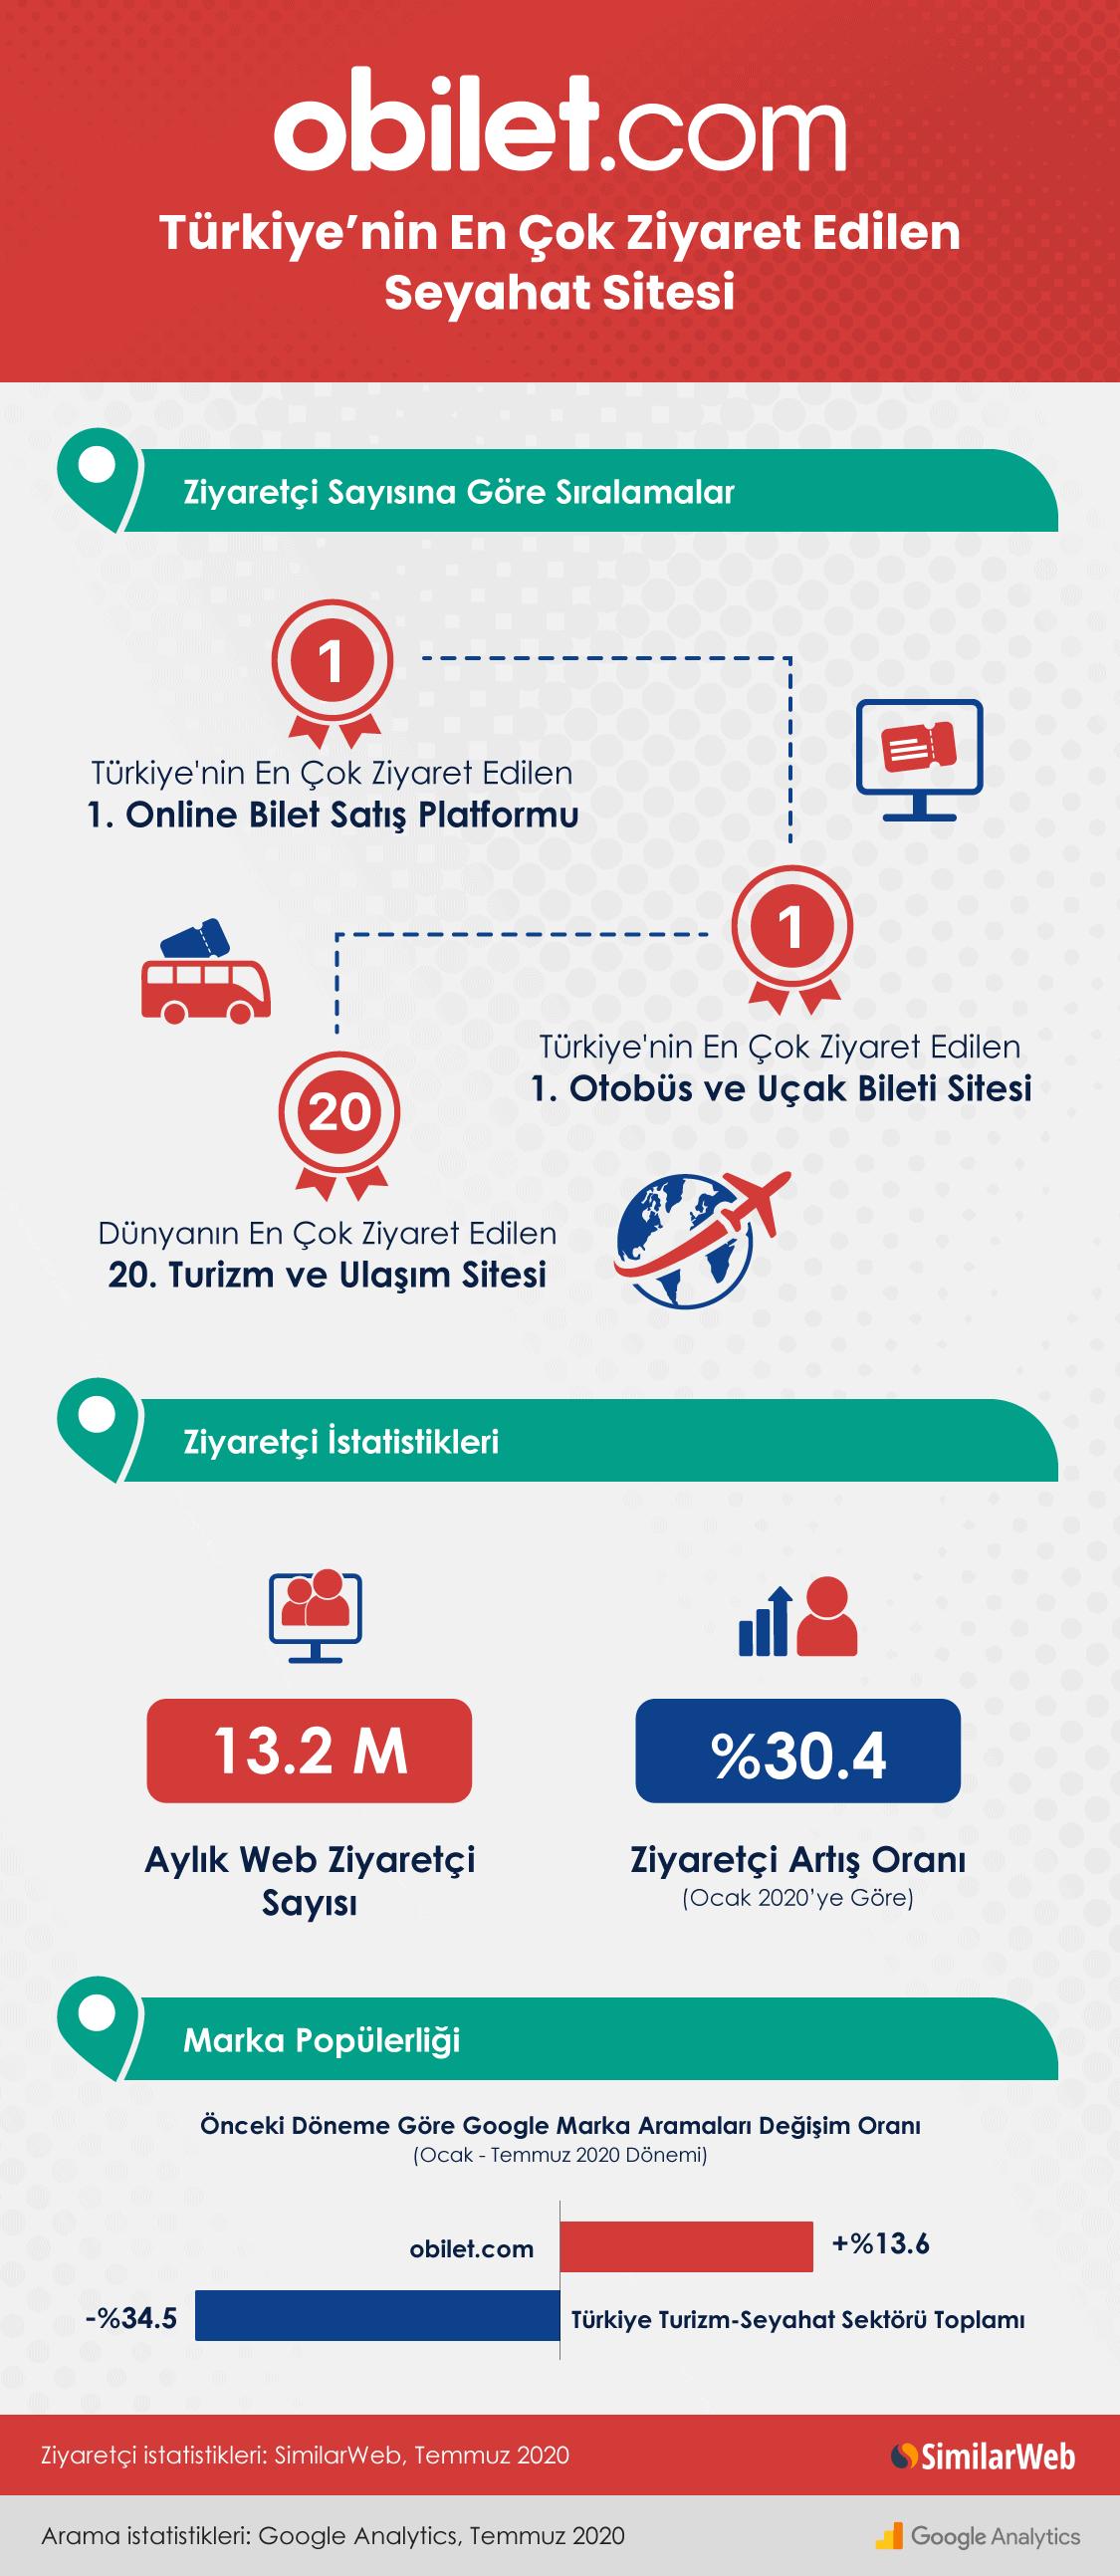 obilet.com SimilarWeb